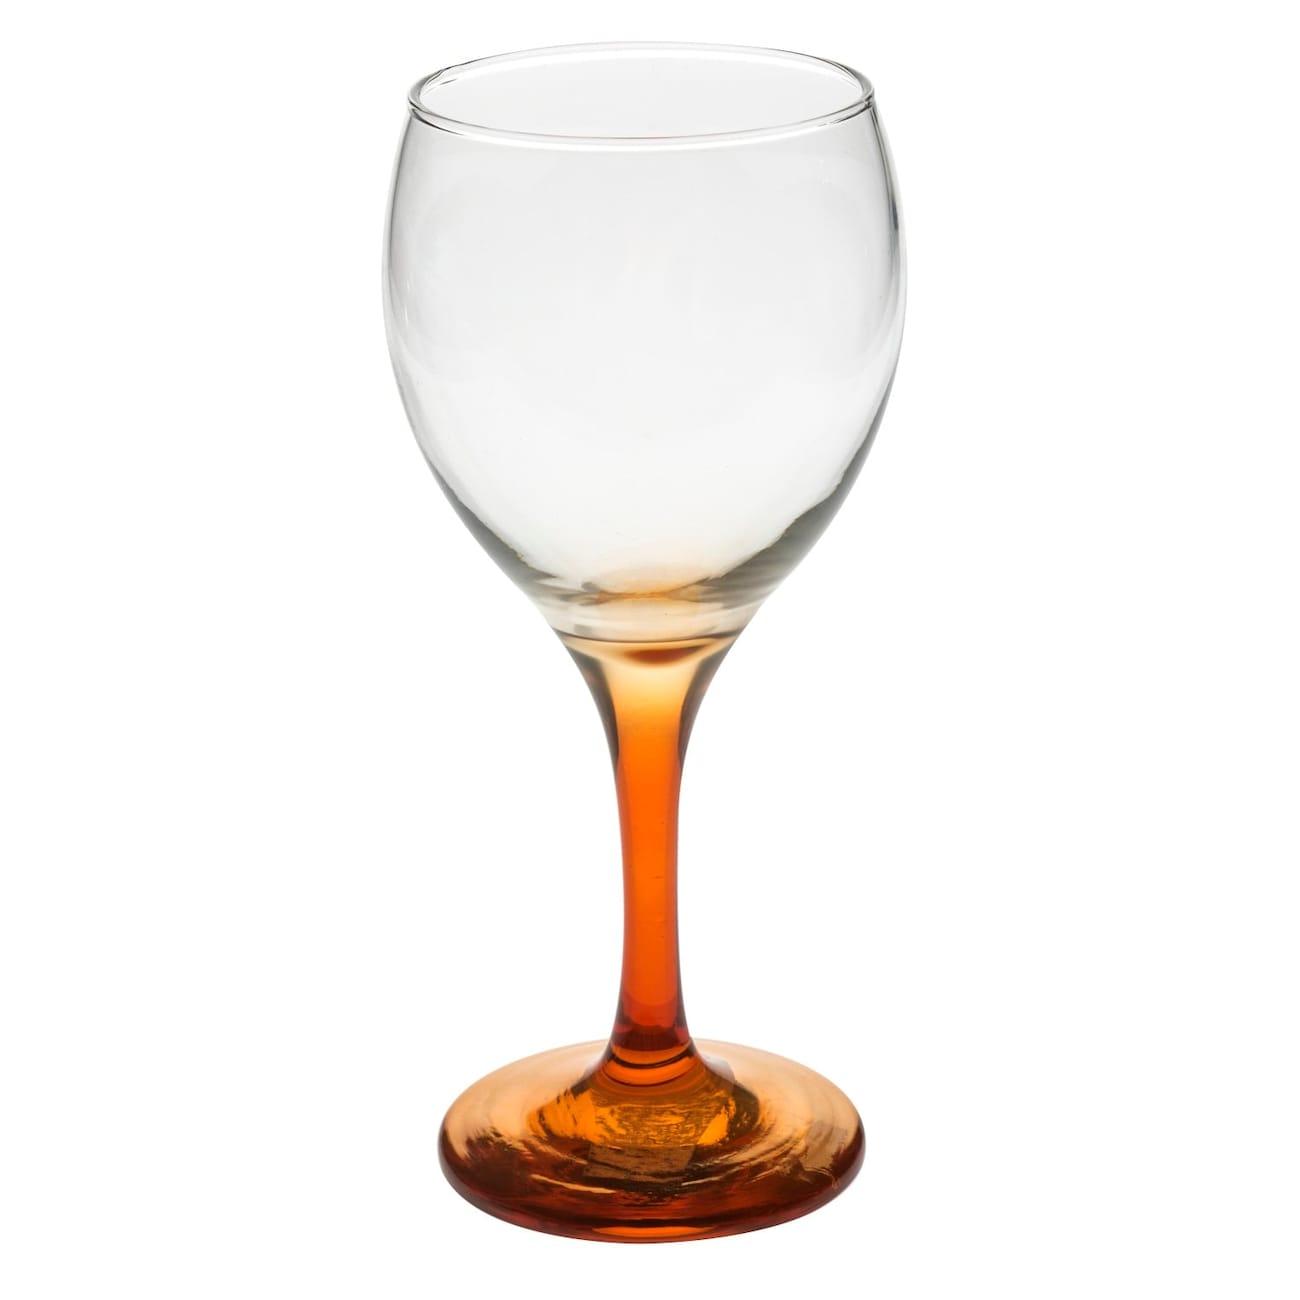 Dollartreecom Bulk Glasses Drinkware